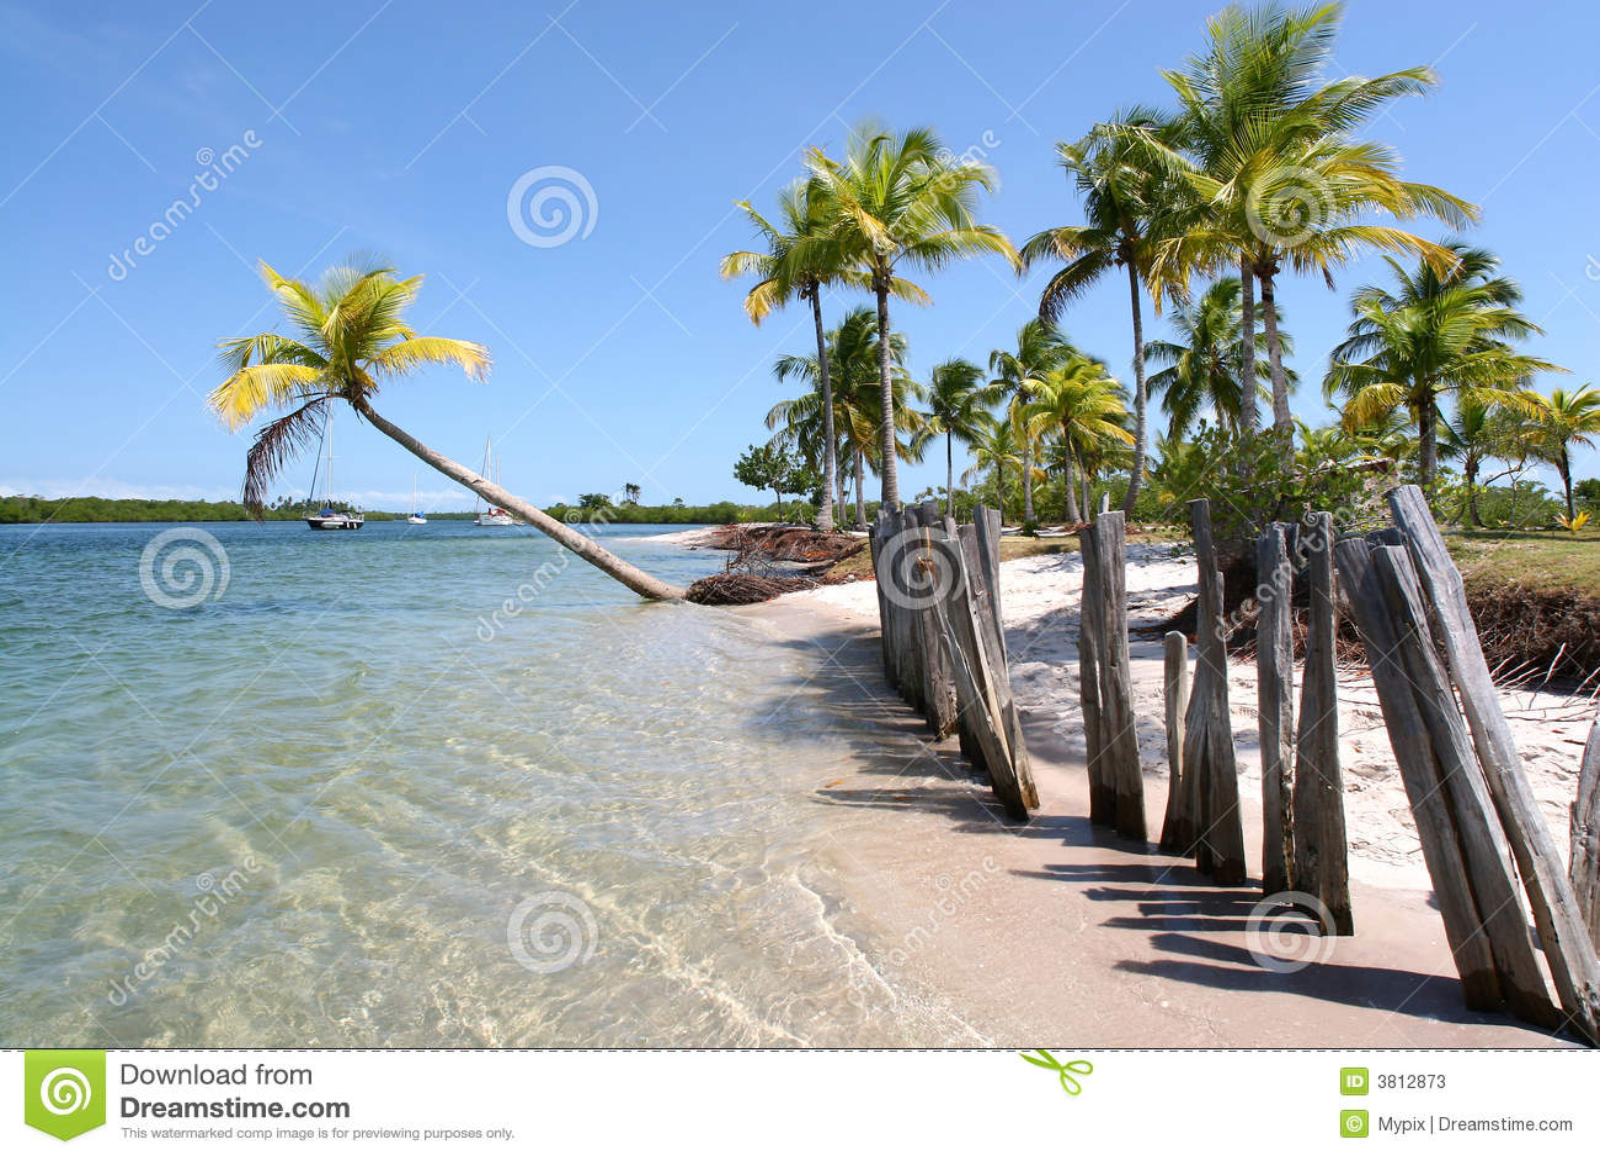 Tropical Island Beach Houses